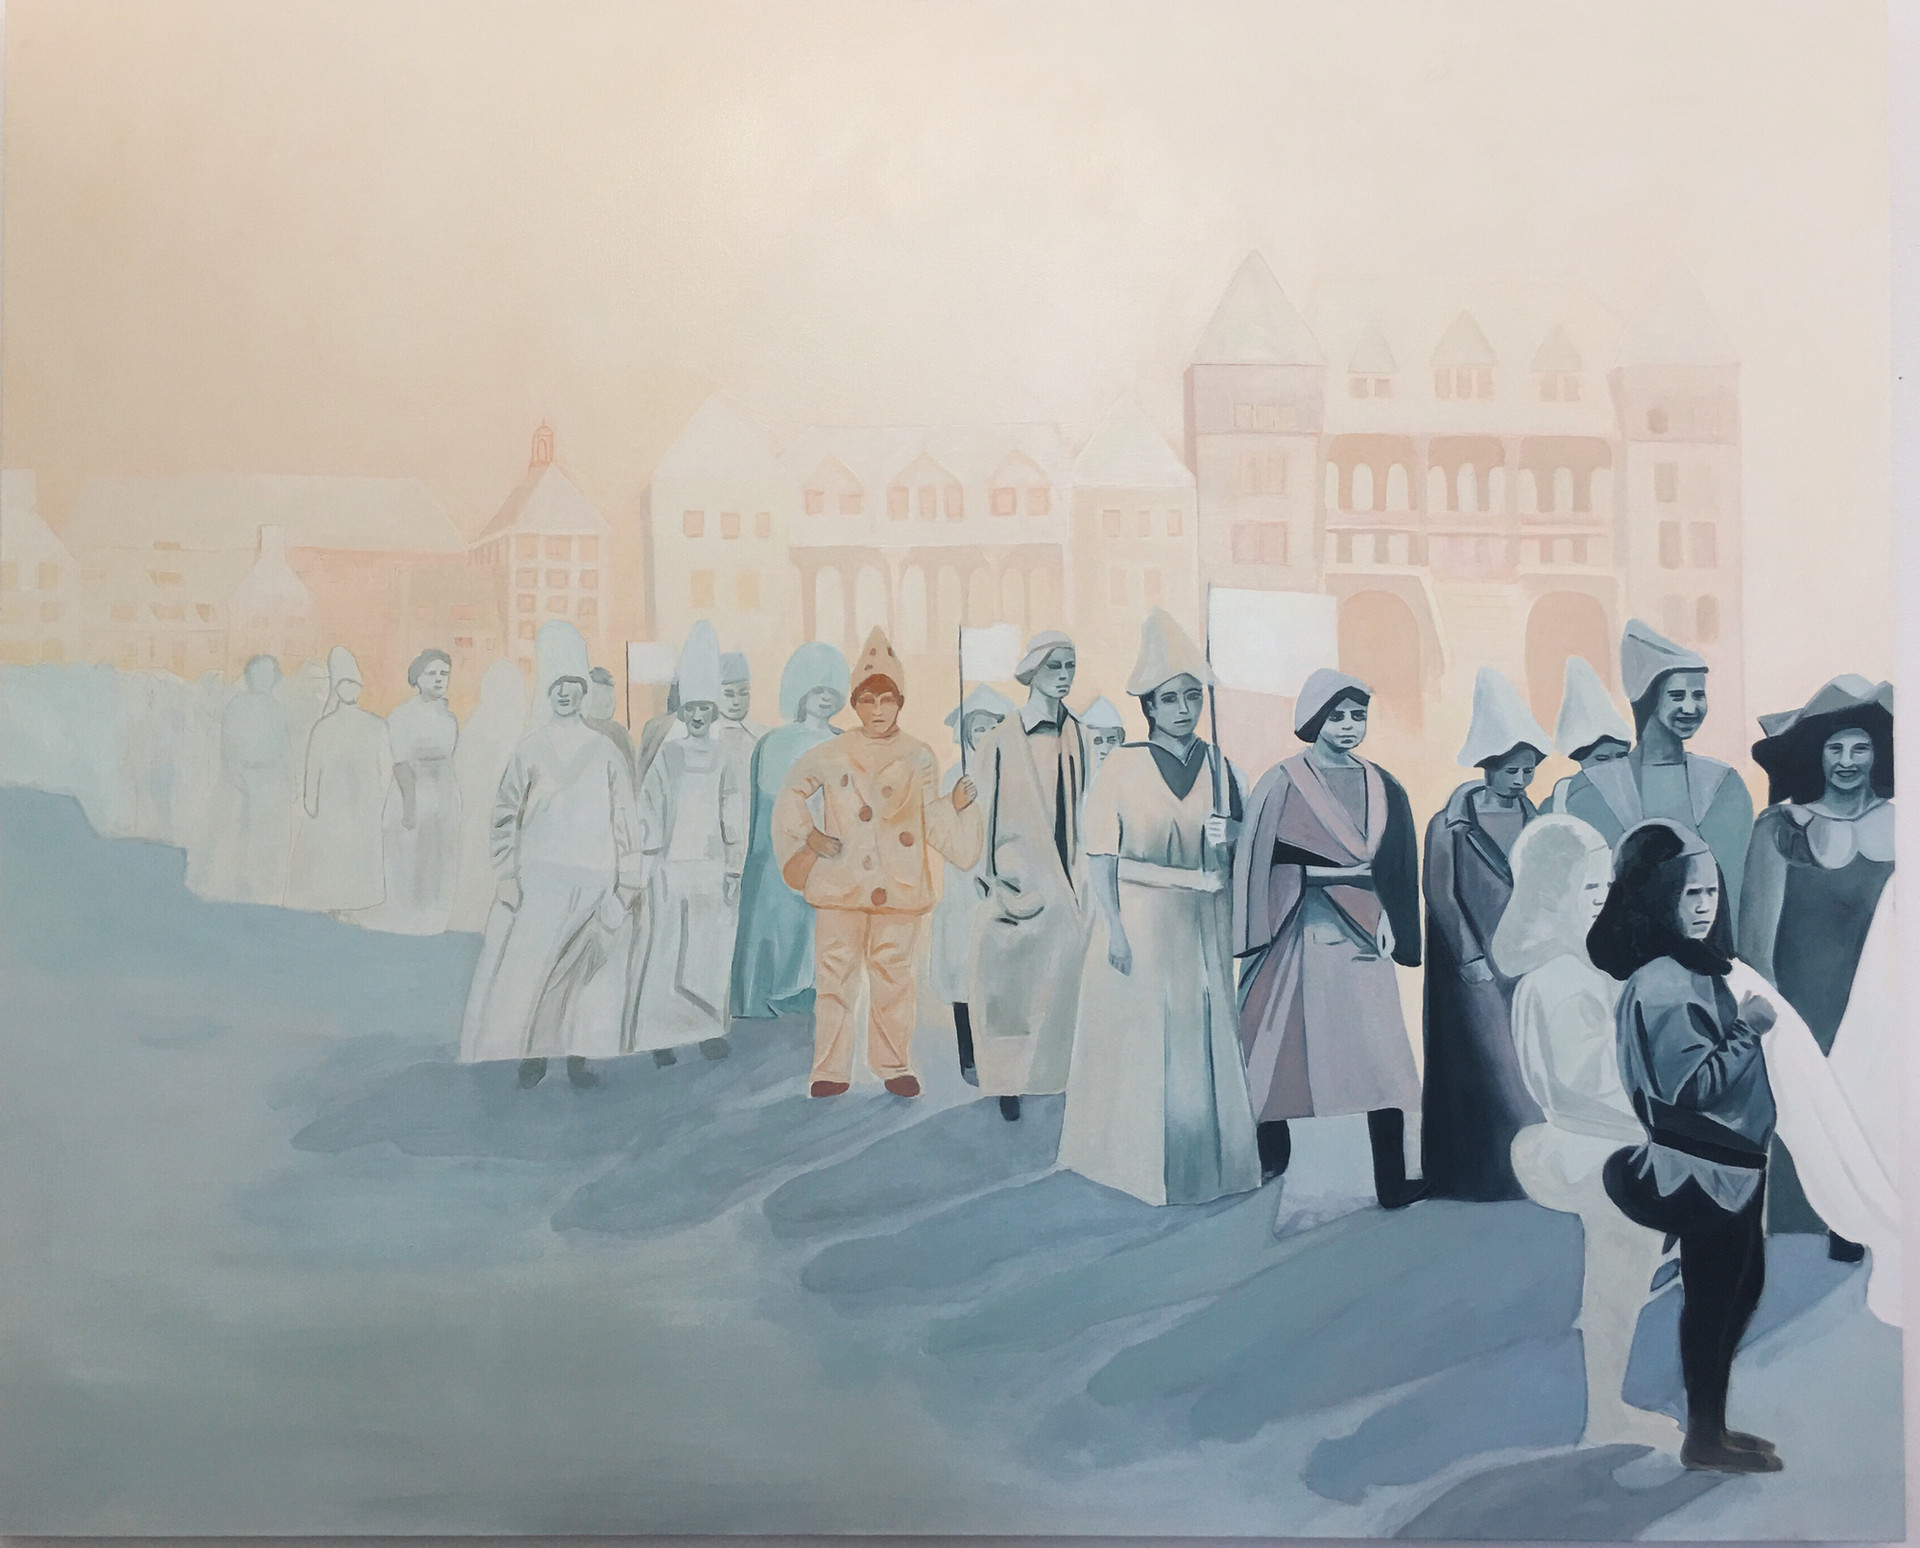 Procession, oil on canvas, 130 x 160 cm